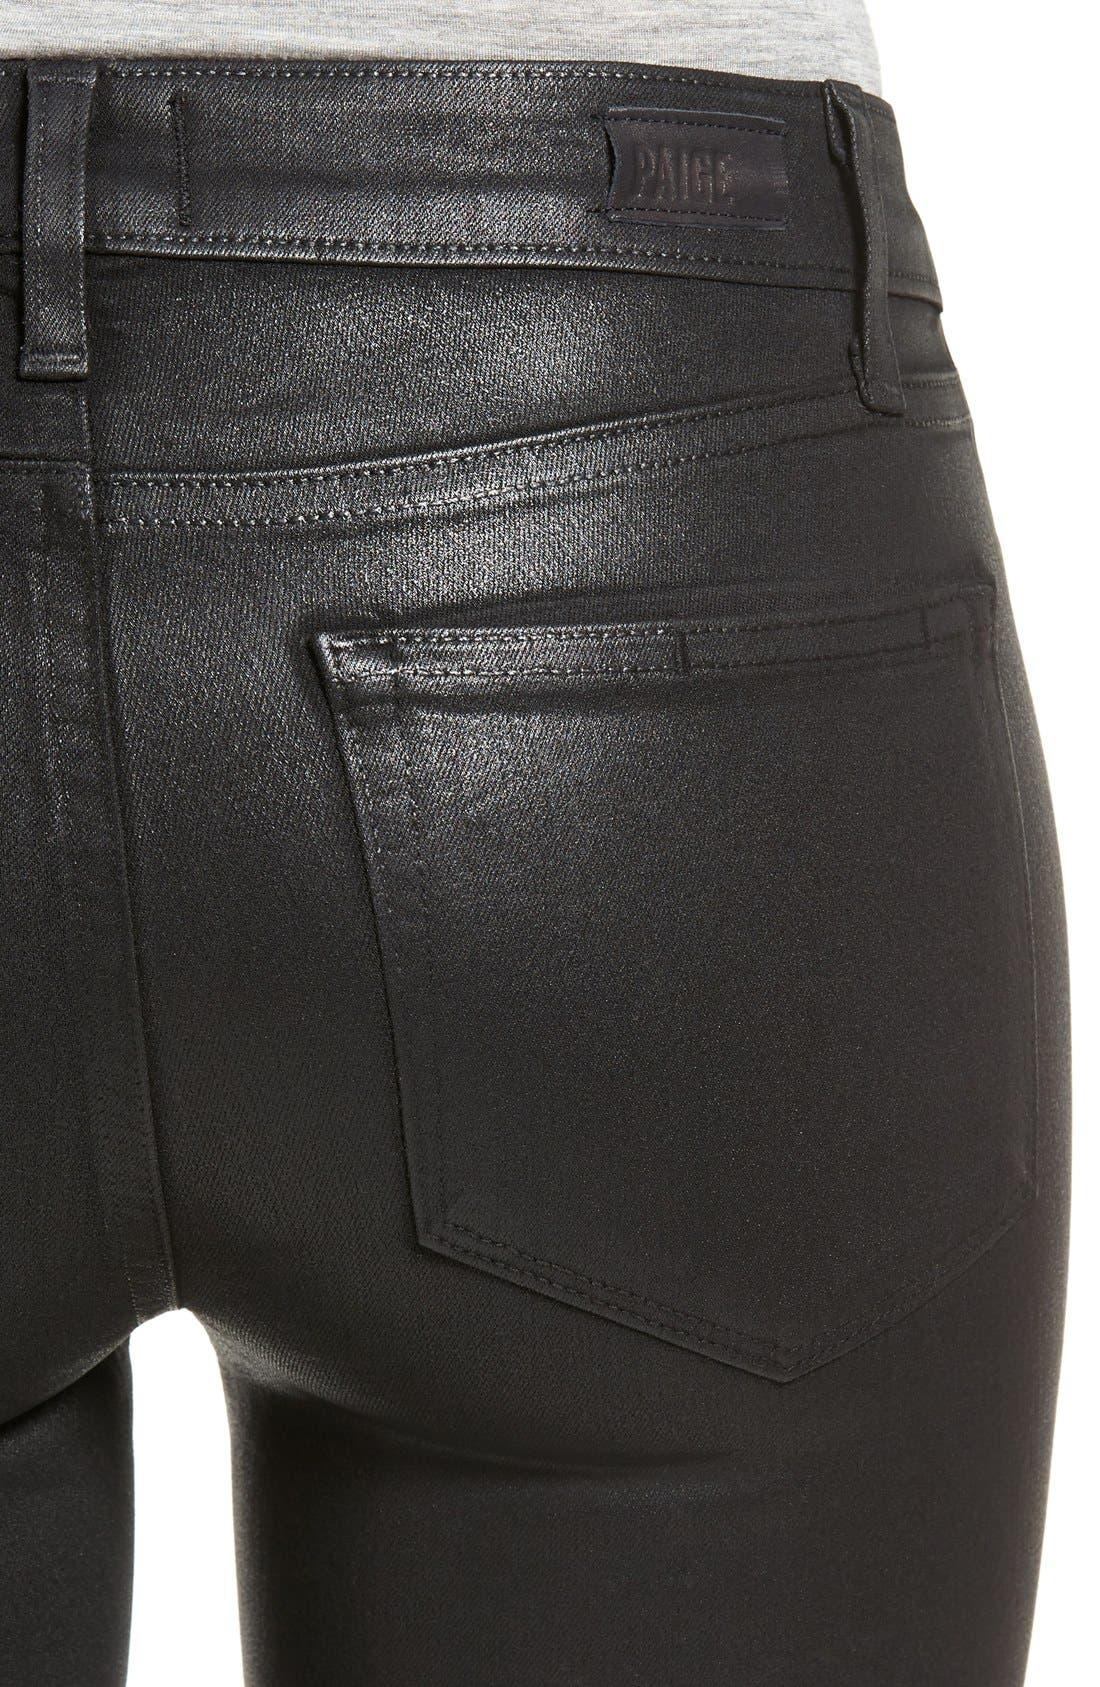 Verdugo Coated Ankle Skinny Jeans,                             Alternate thumbnail 4, color,                             001